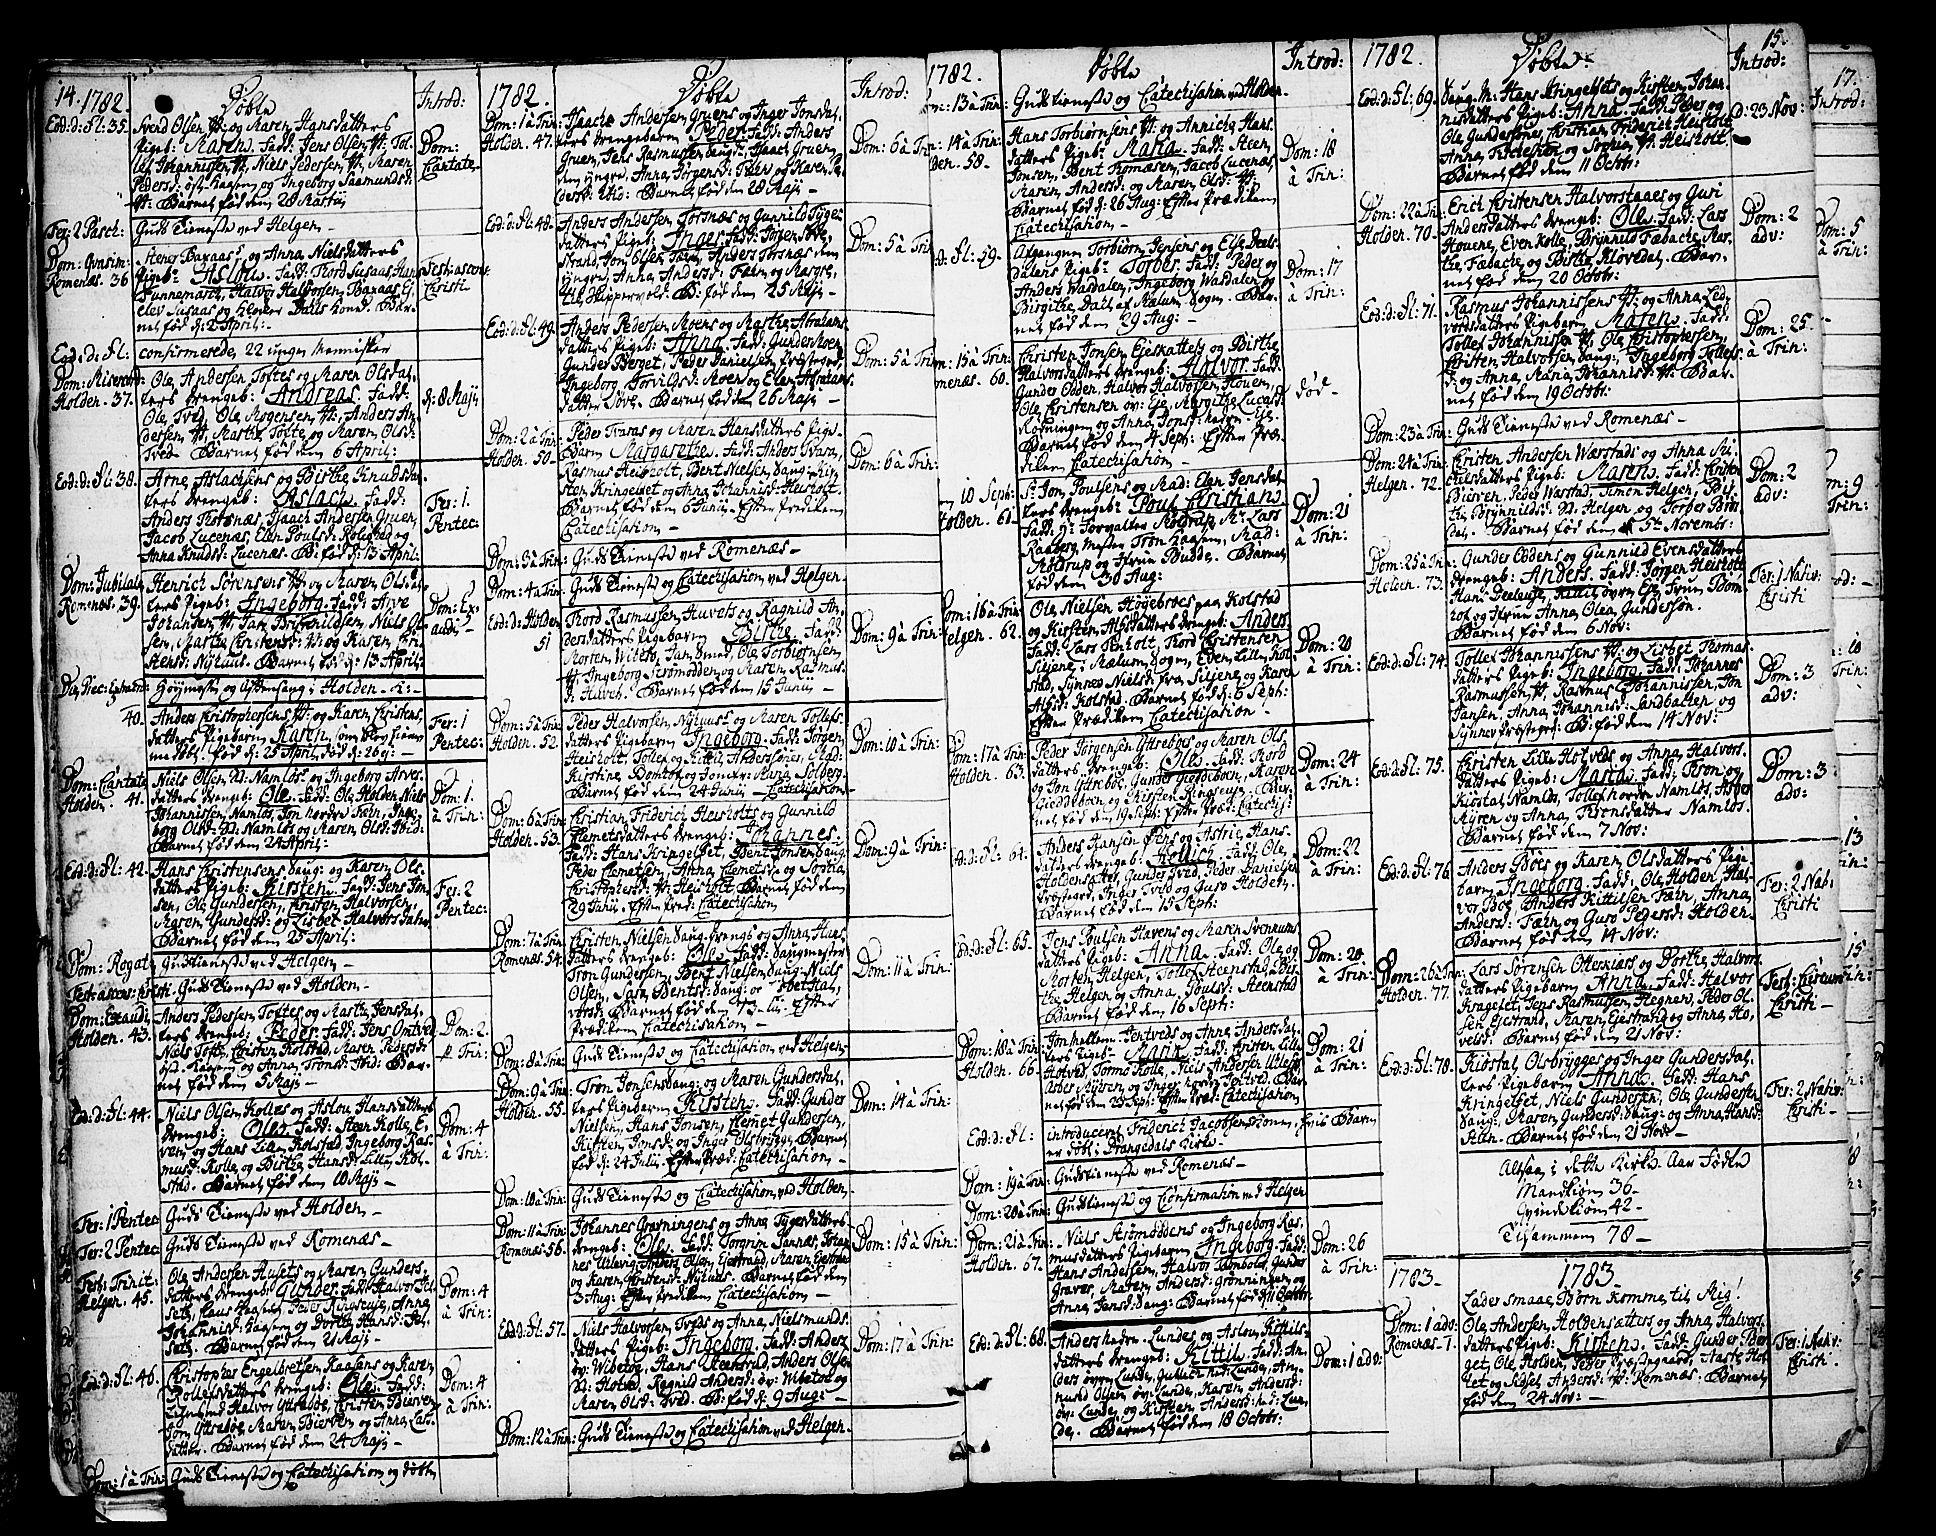 SAKO, Holla kirkebøker, F/Fa/L0002: Ministerialbok nr. 2, 1779-1814, s. 14-15